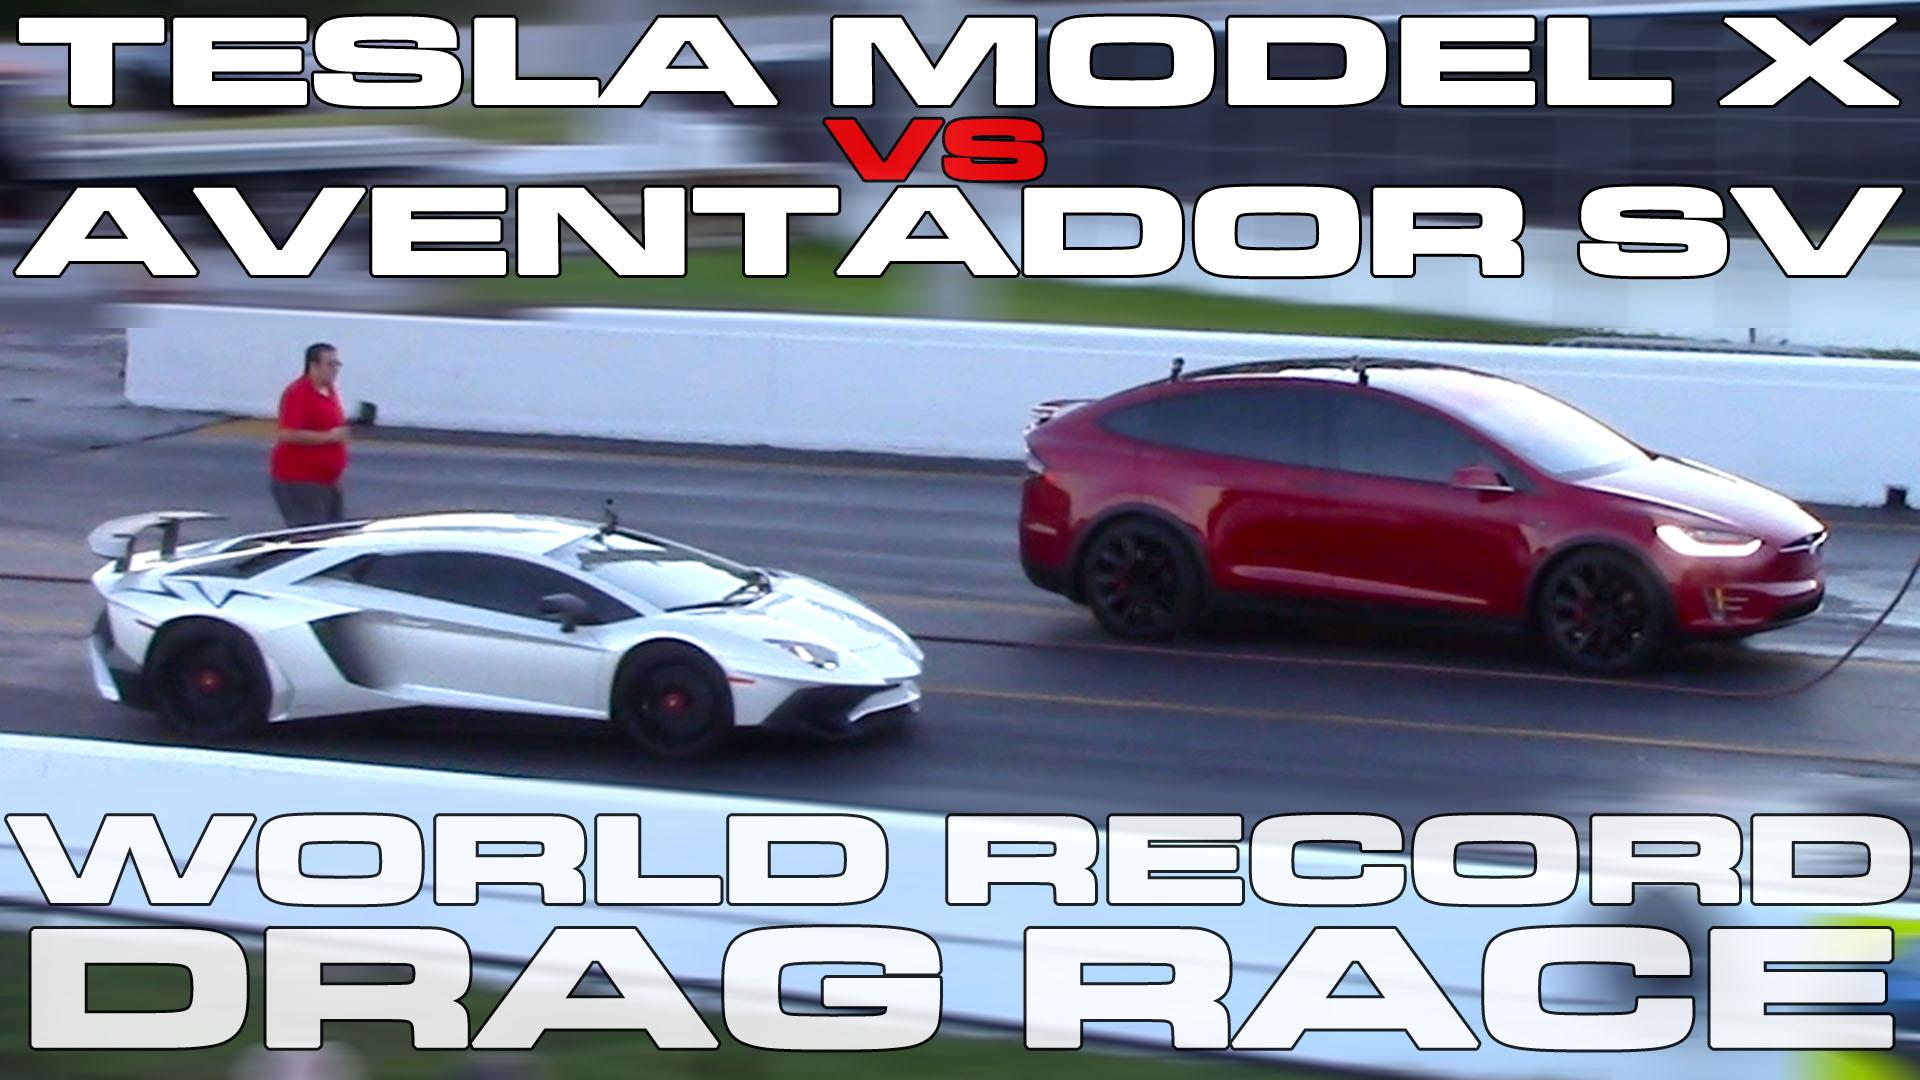 Tesla Model X P100D Ludicrous sets World Record Racing a Lamborghini Aventador SV Drag Racing